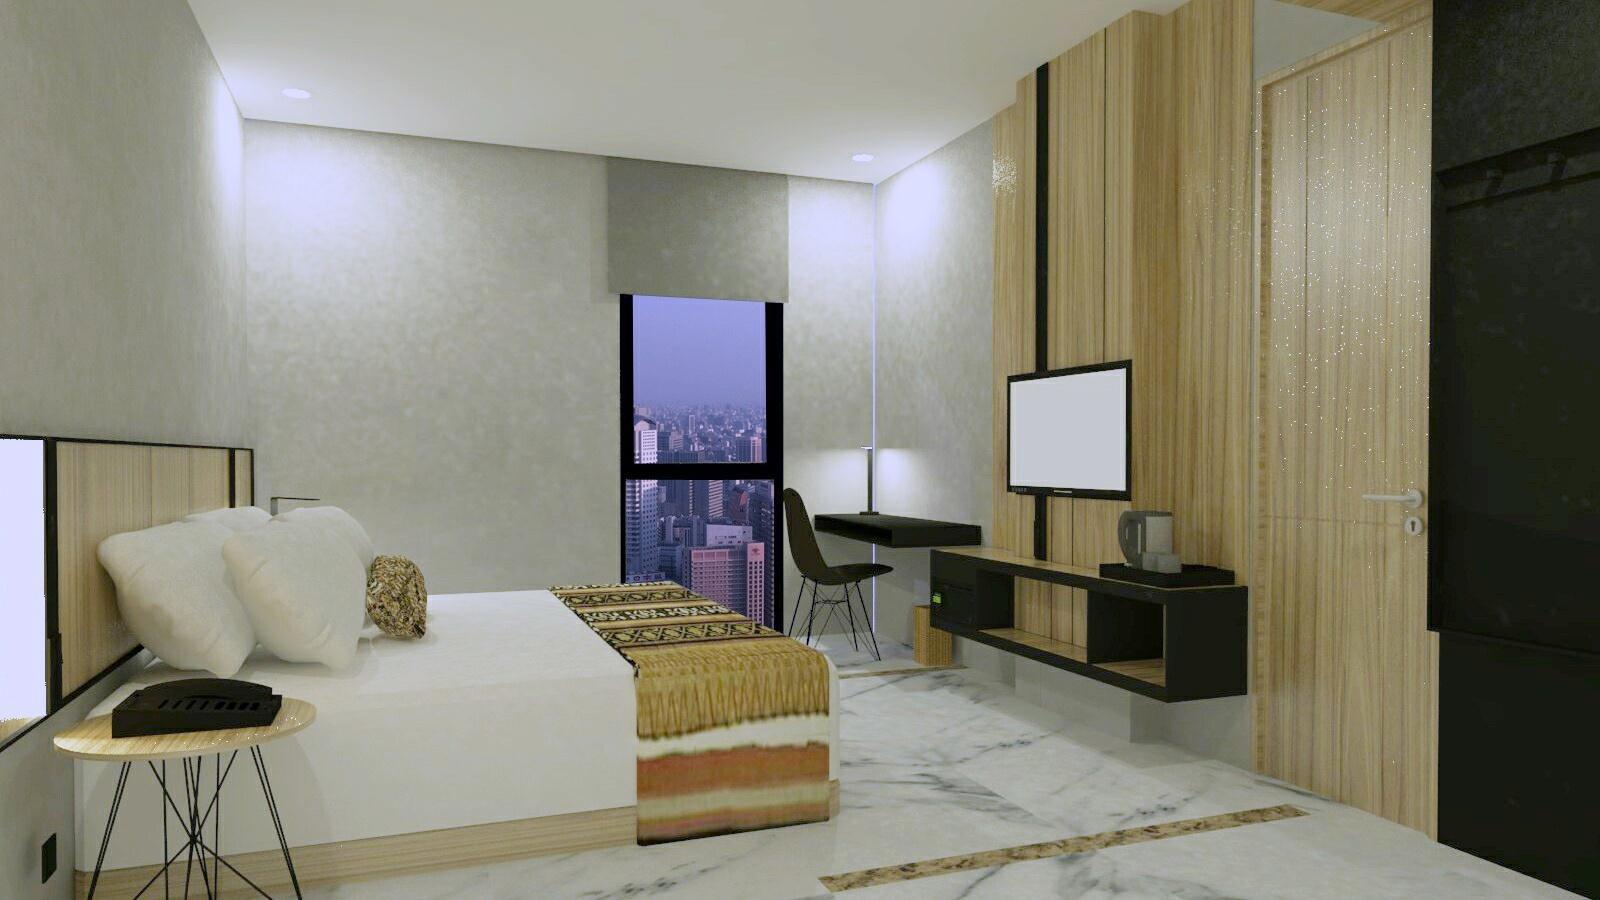 BBC Hotel Lampung Bandar Jaya